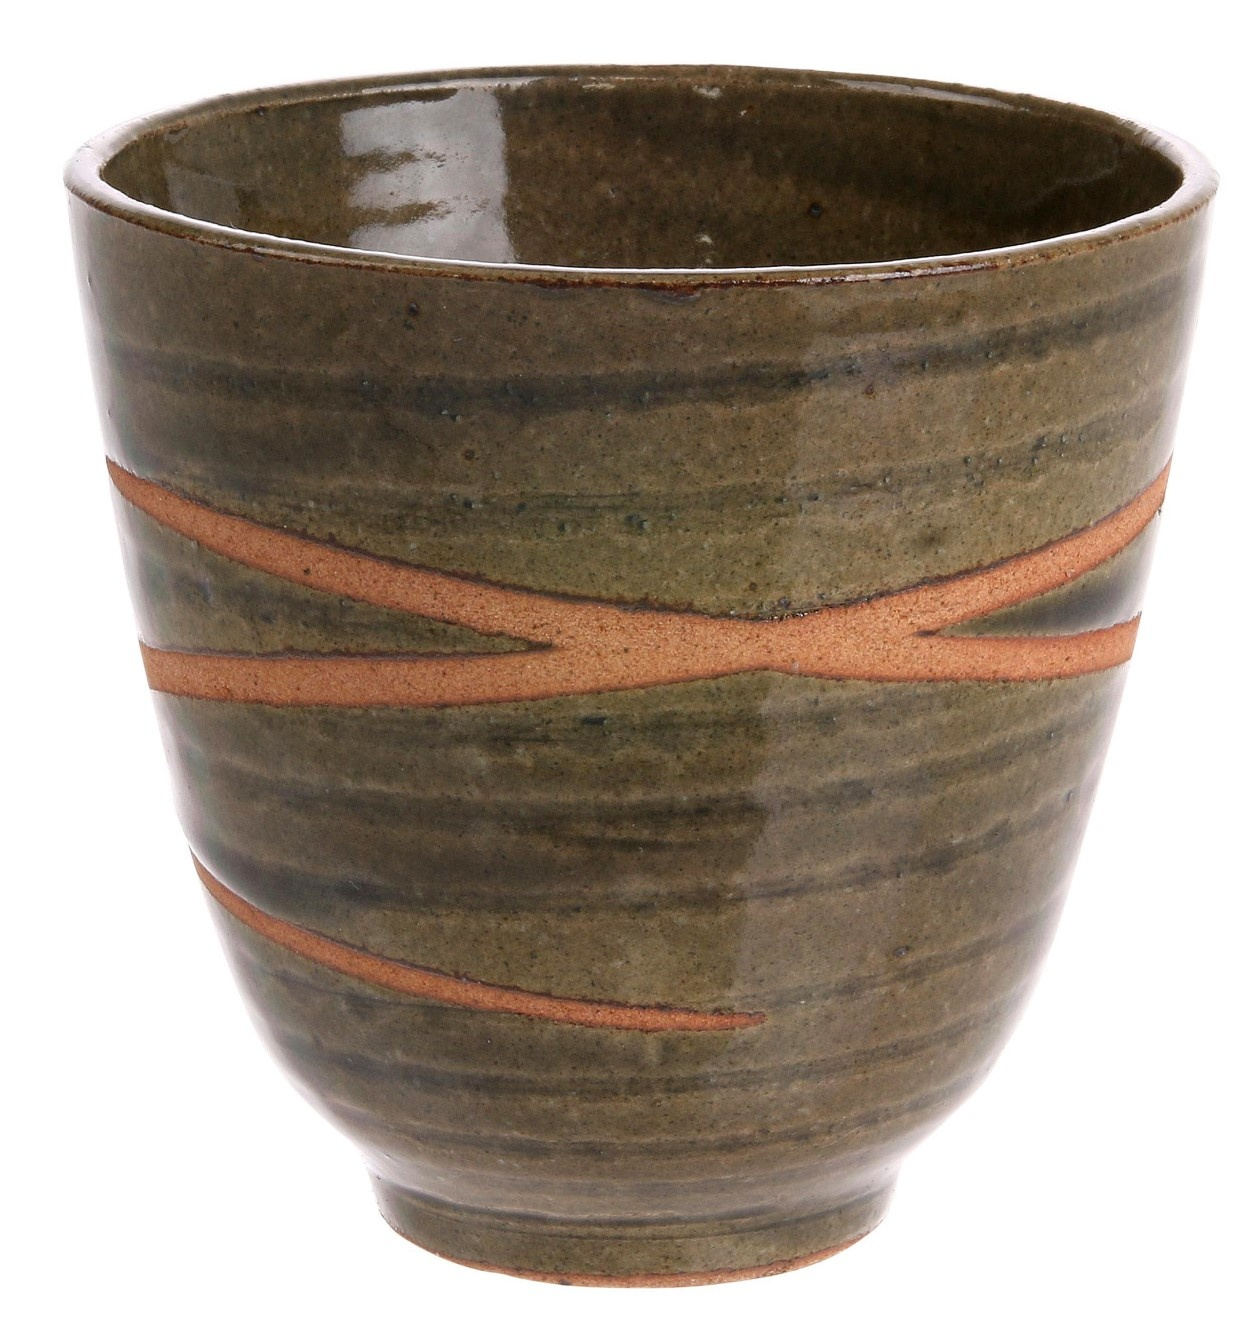 Mok kyoto ceramics: japanese yunomi mugs green-1